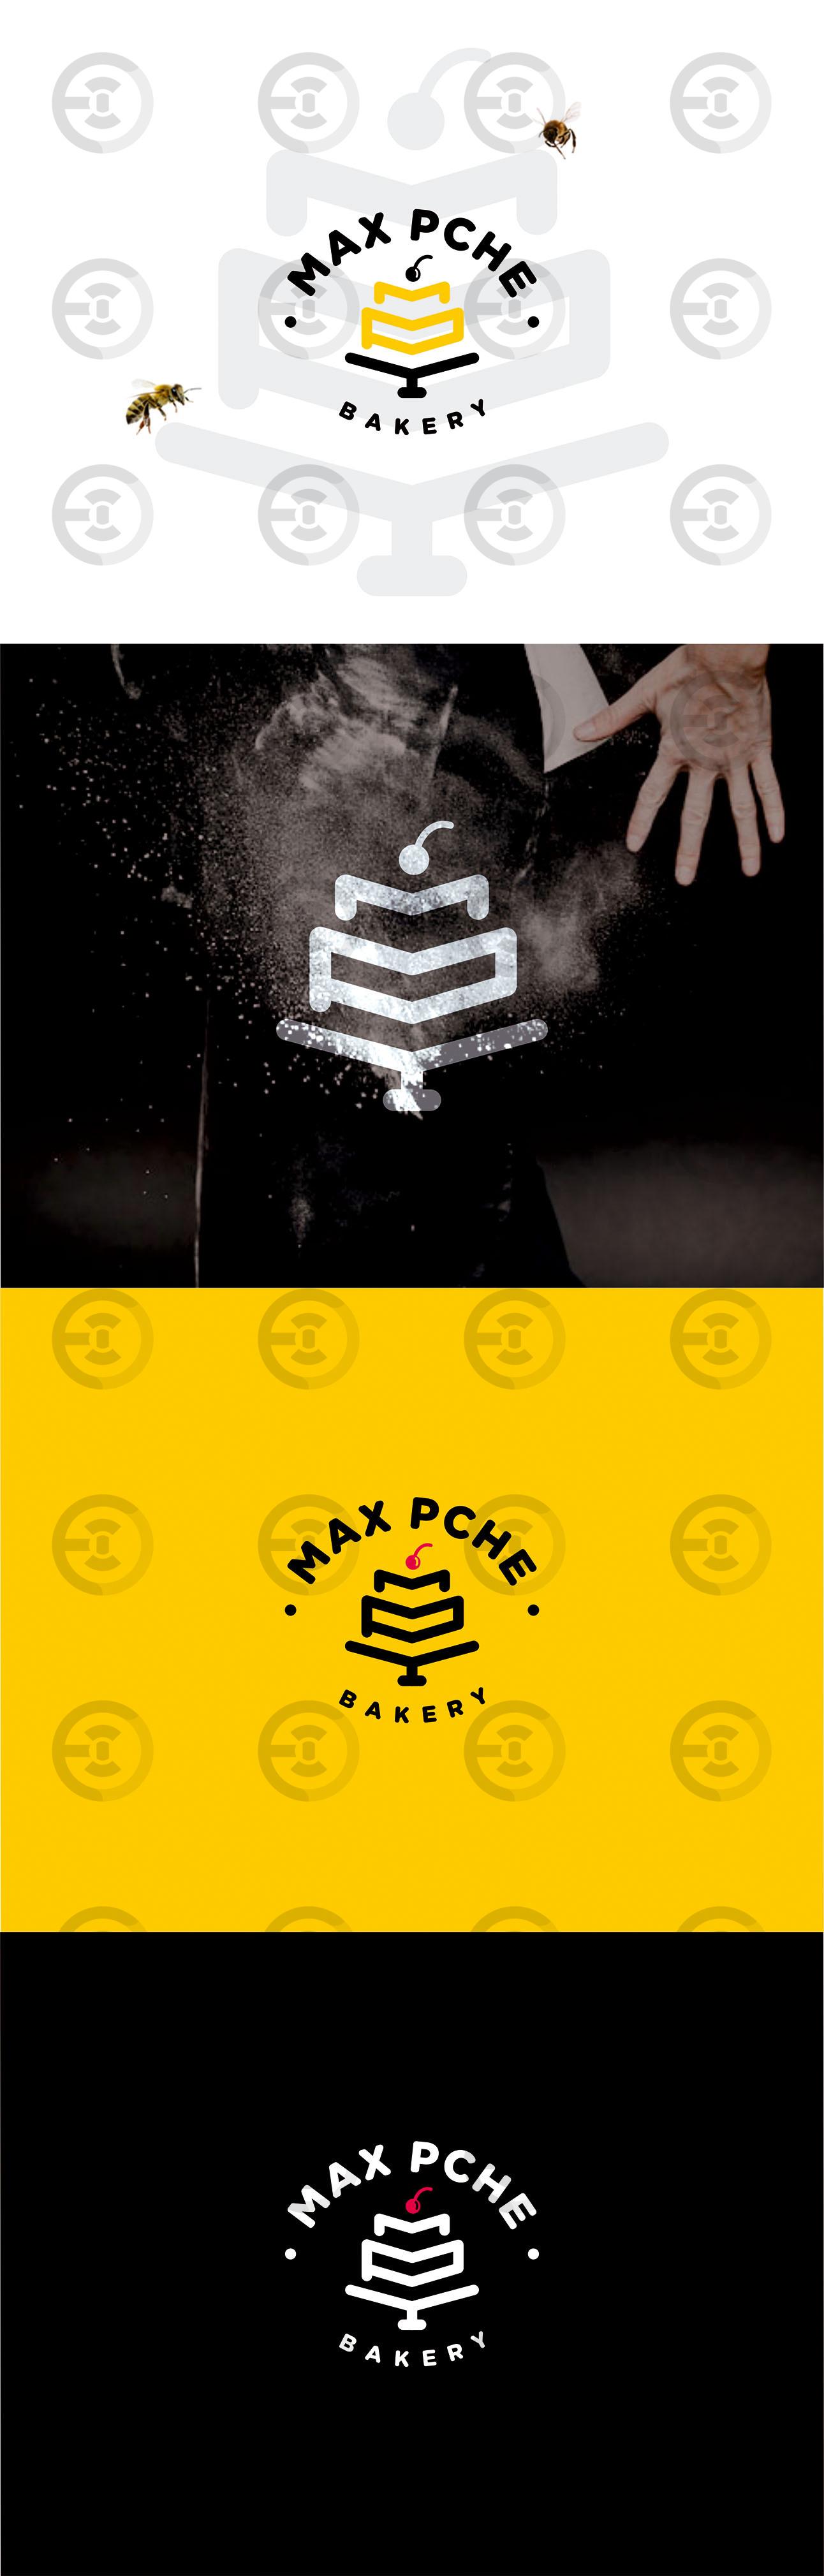 MaxPche bakery_7.jpg